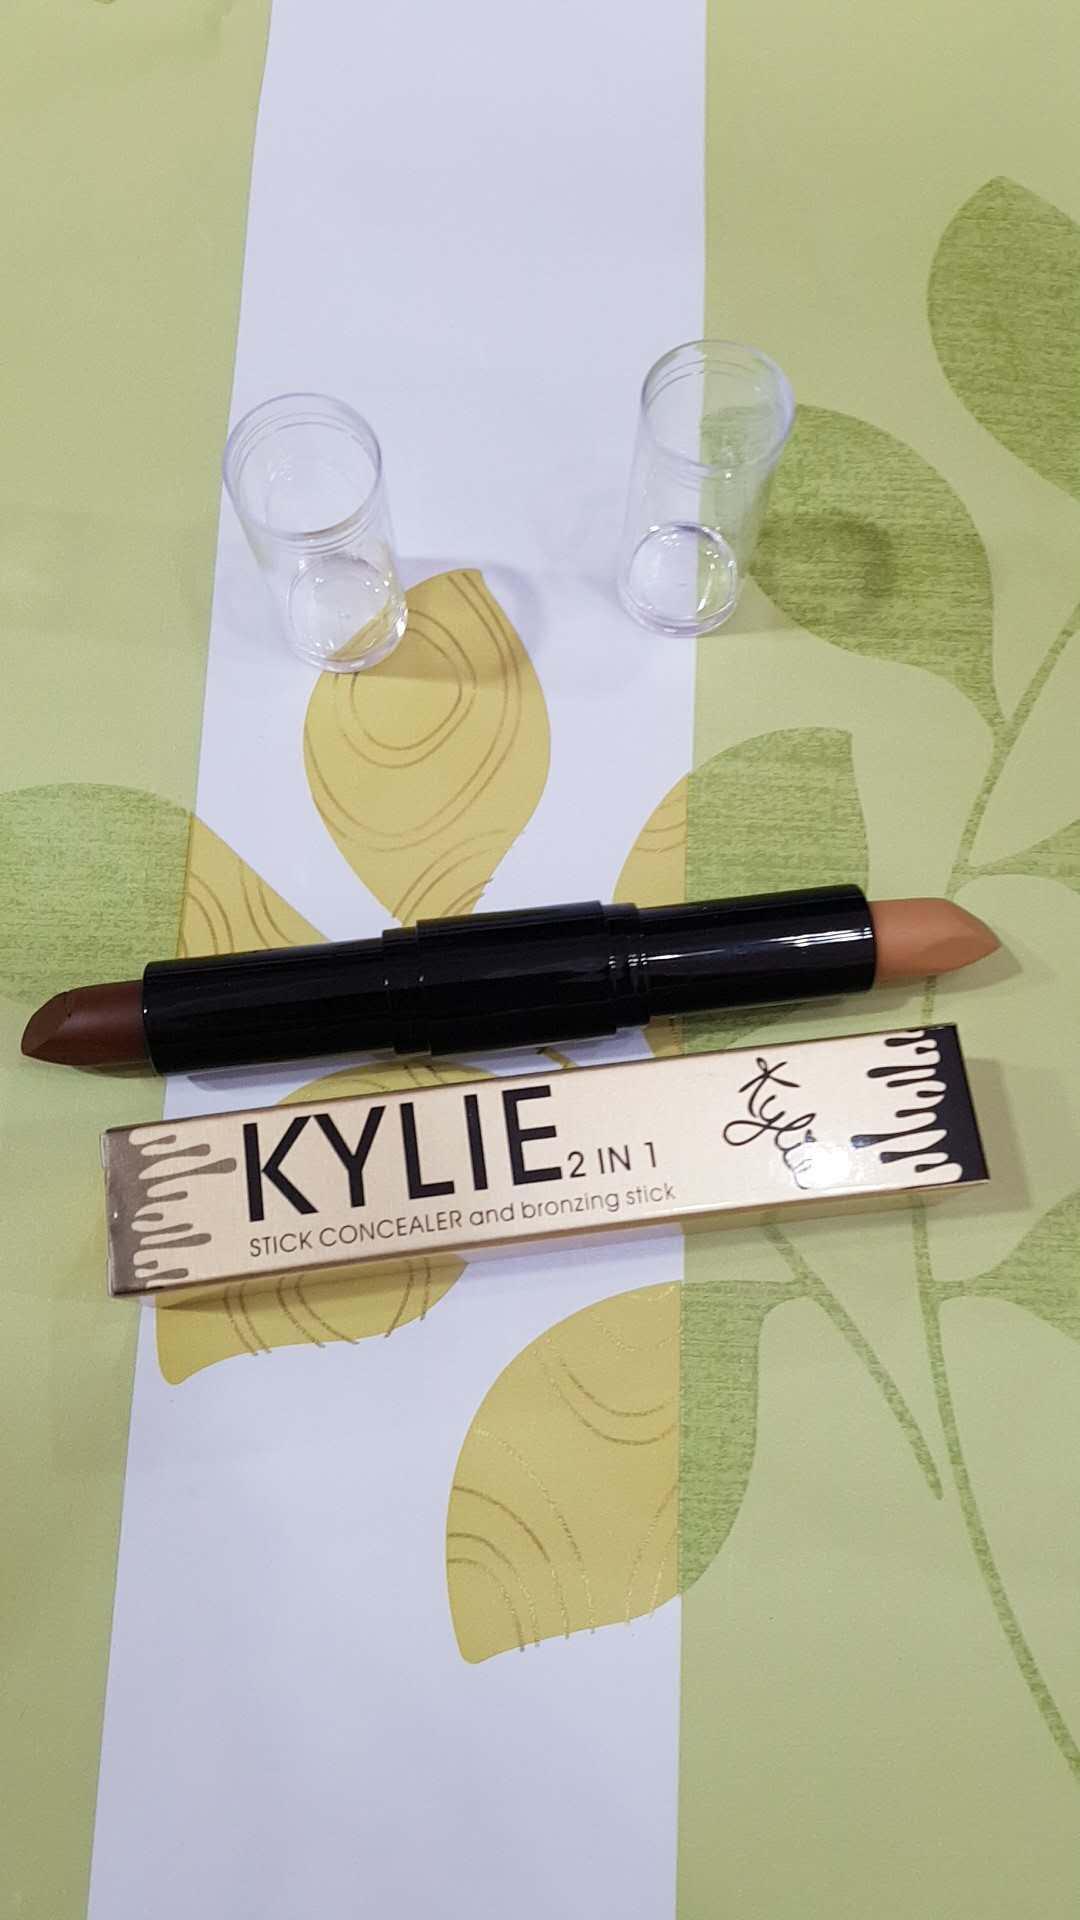 KYLIE- stick concealer and bronzing stick-01 Philippines